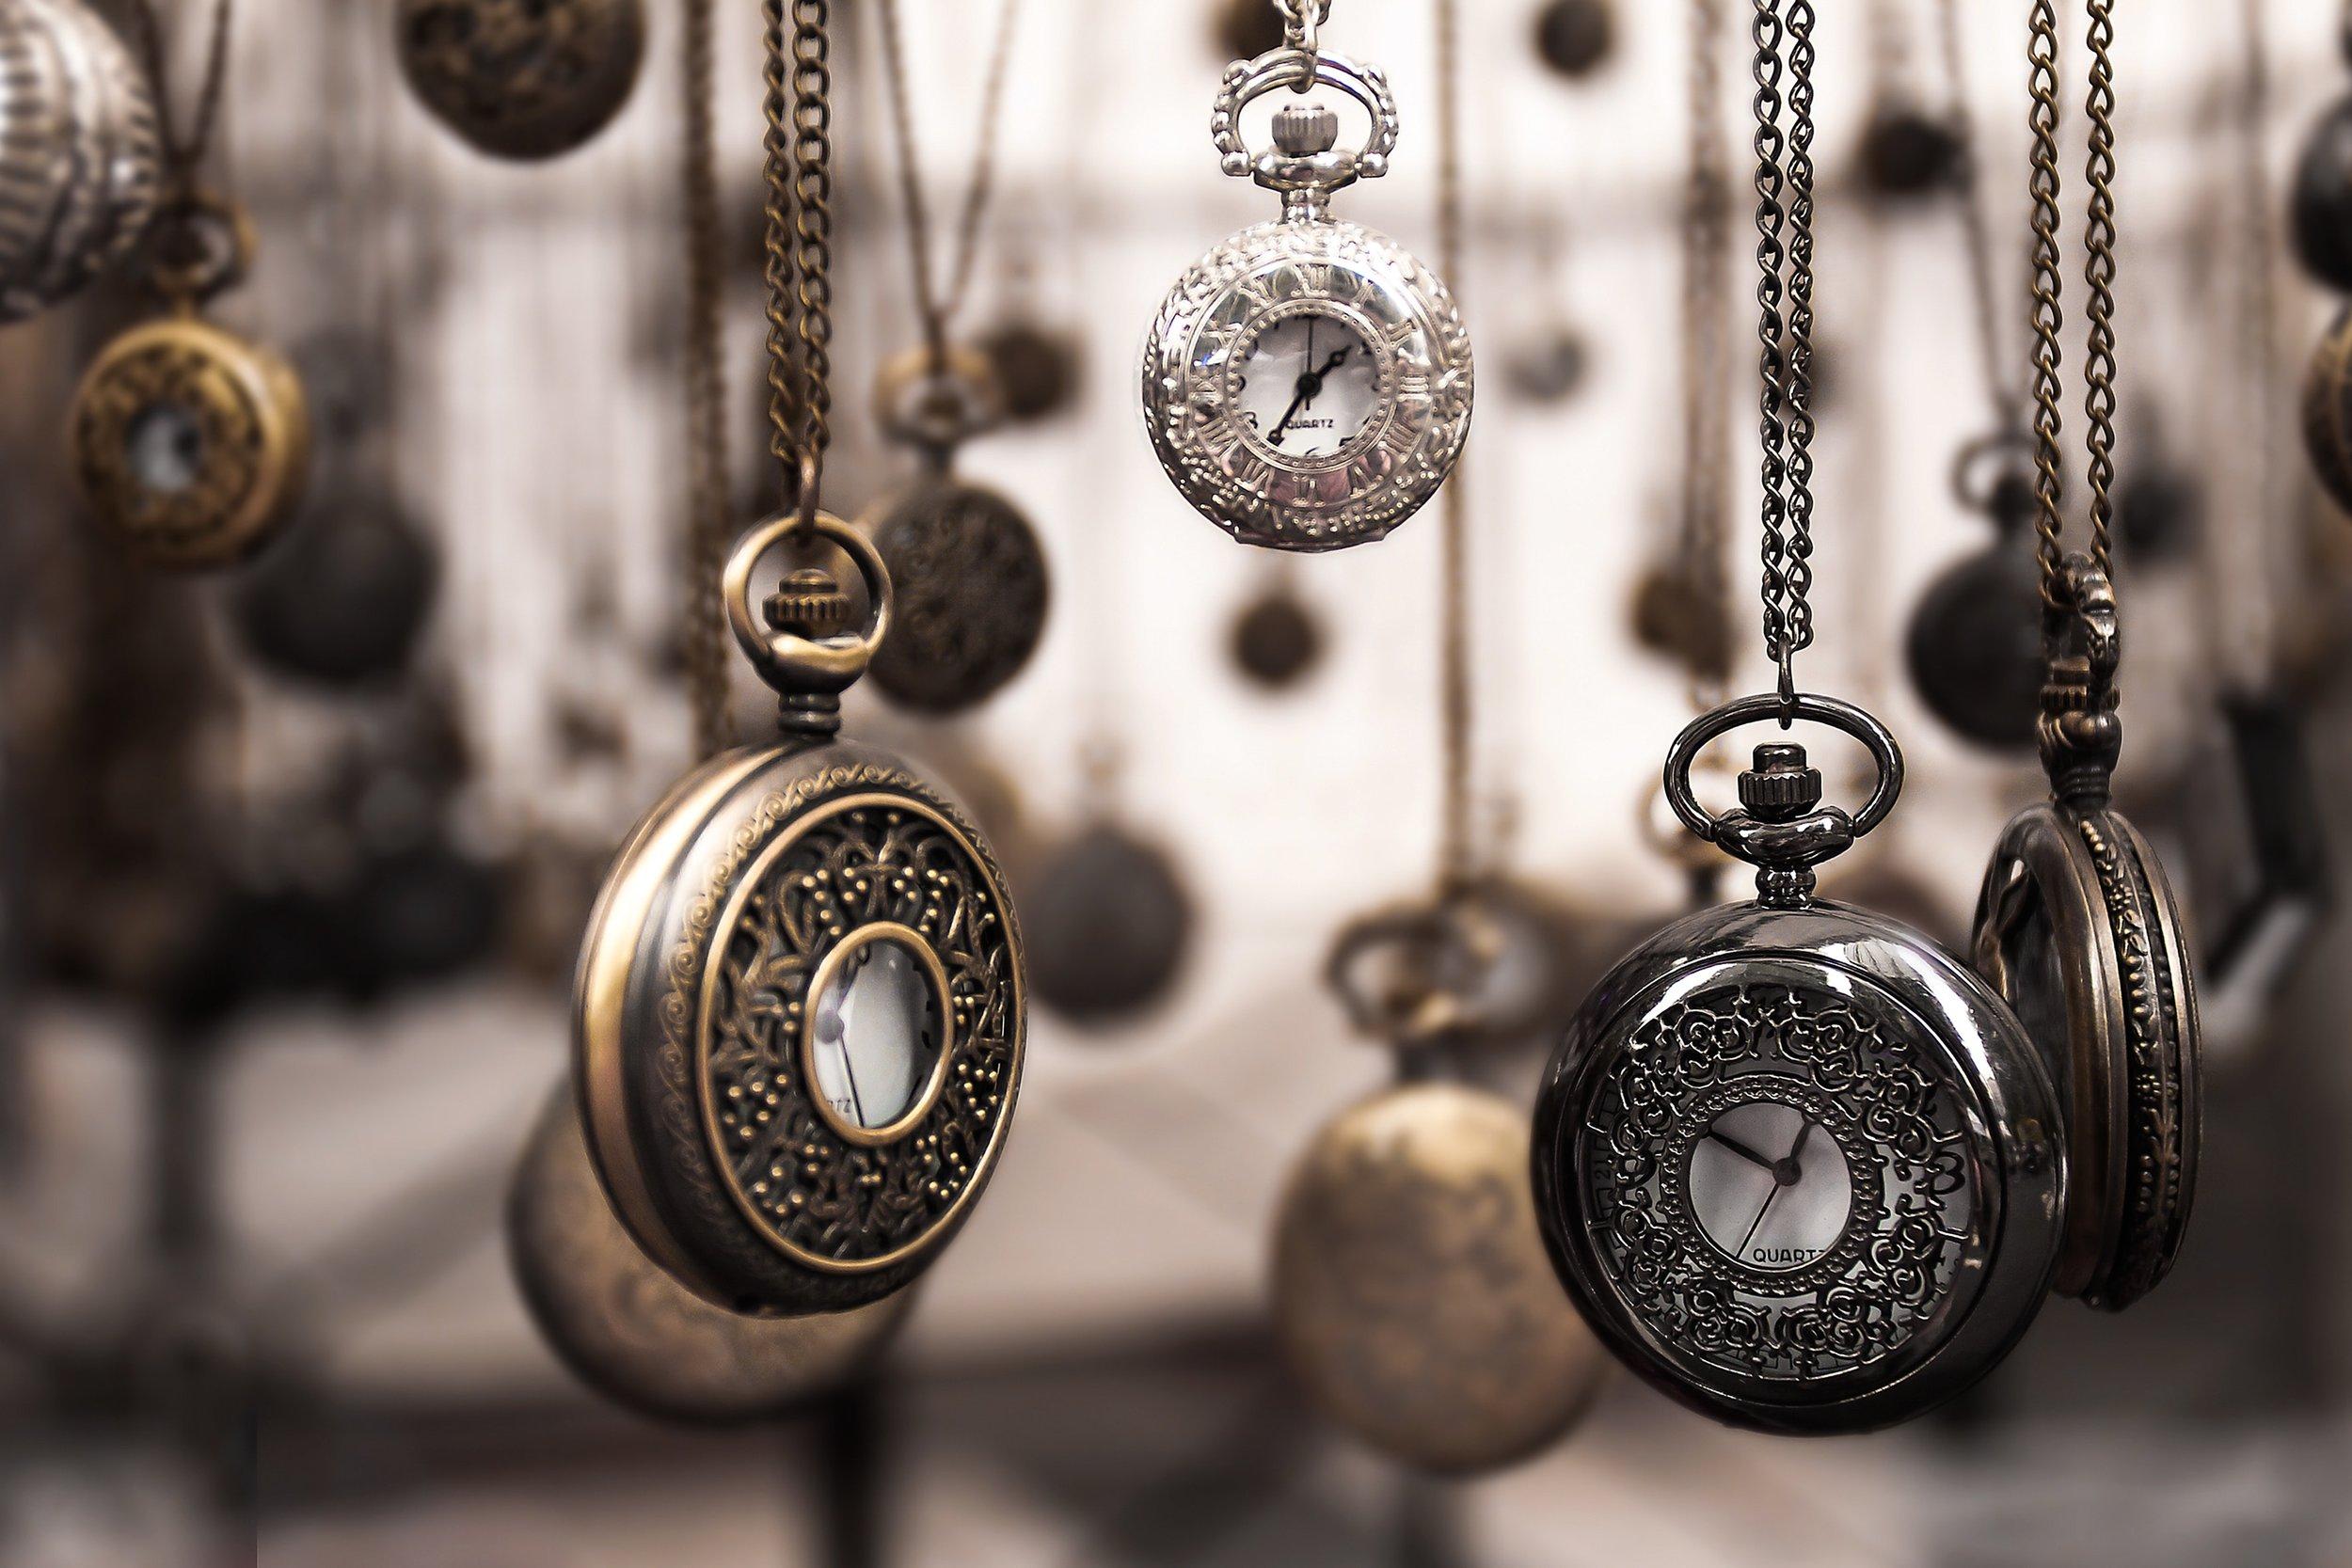 accessory-antique-assorted-859895.jpg